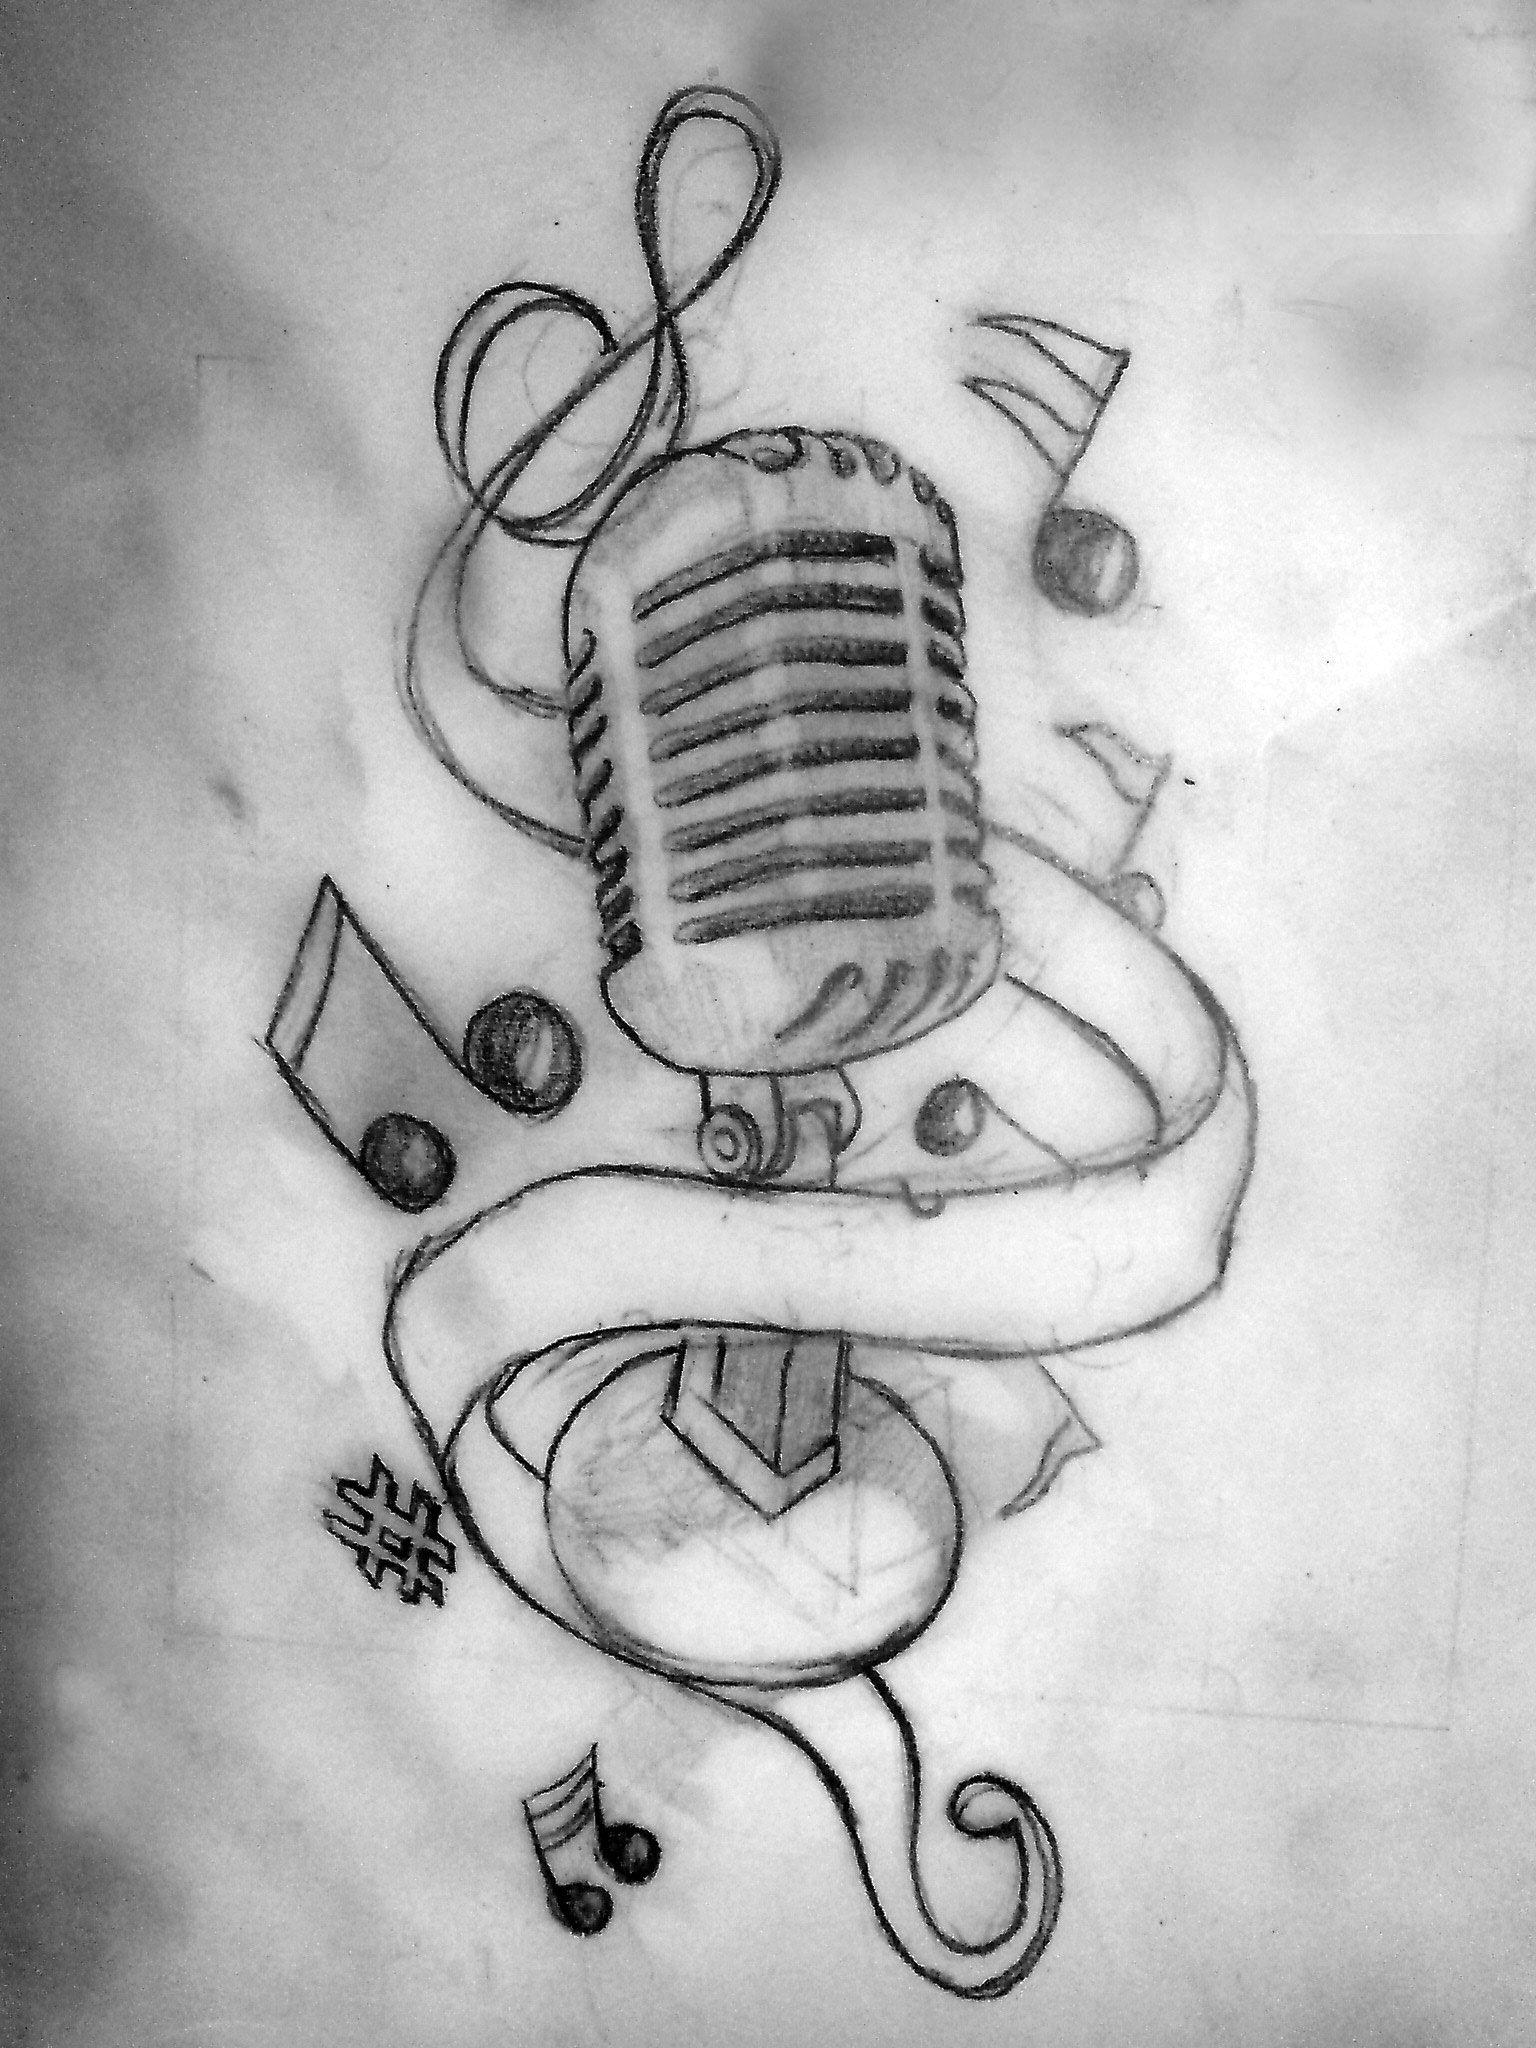 Music Tattoos Designs Cool Tattoos Bonbaden Tattoo Ideas